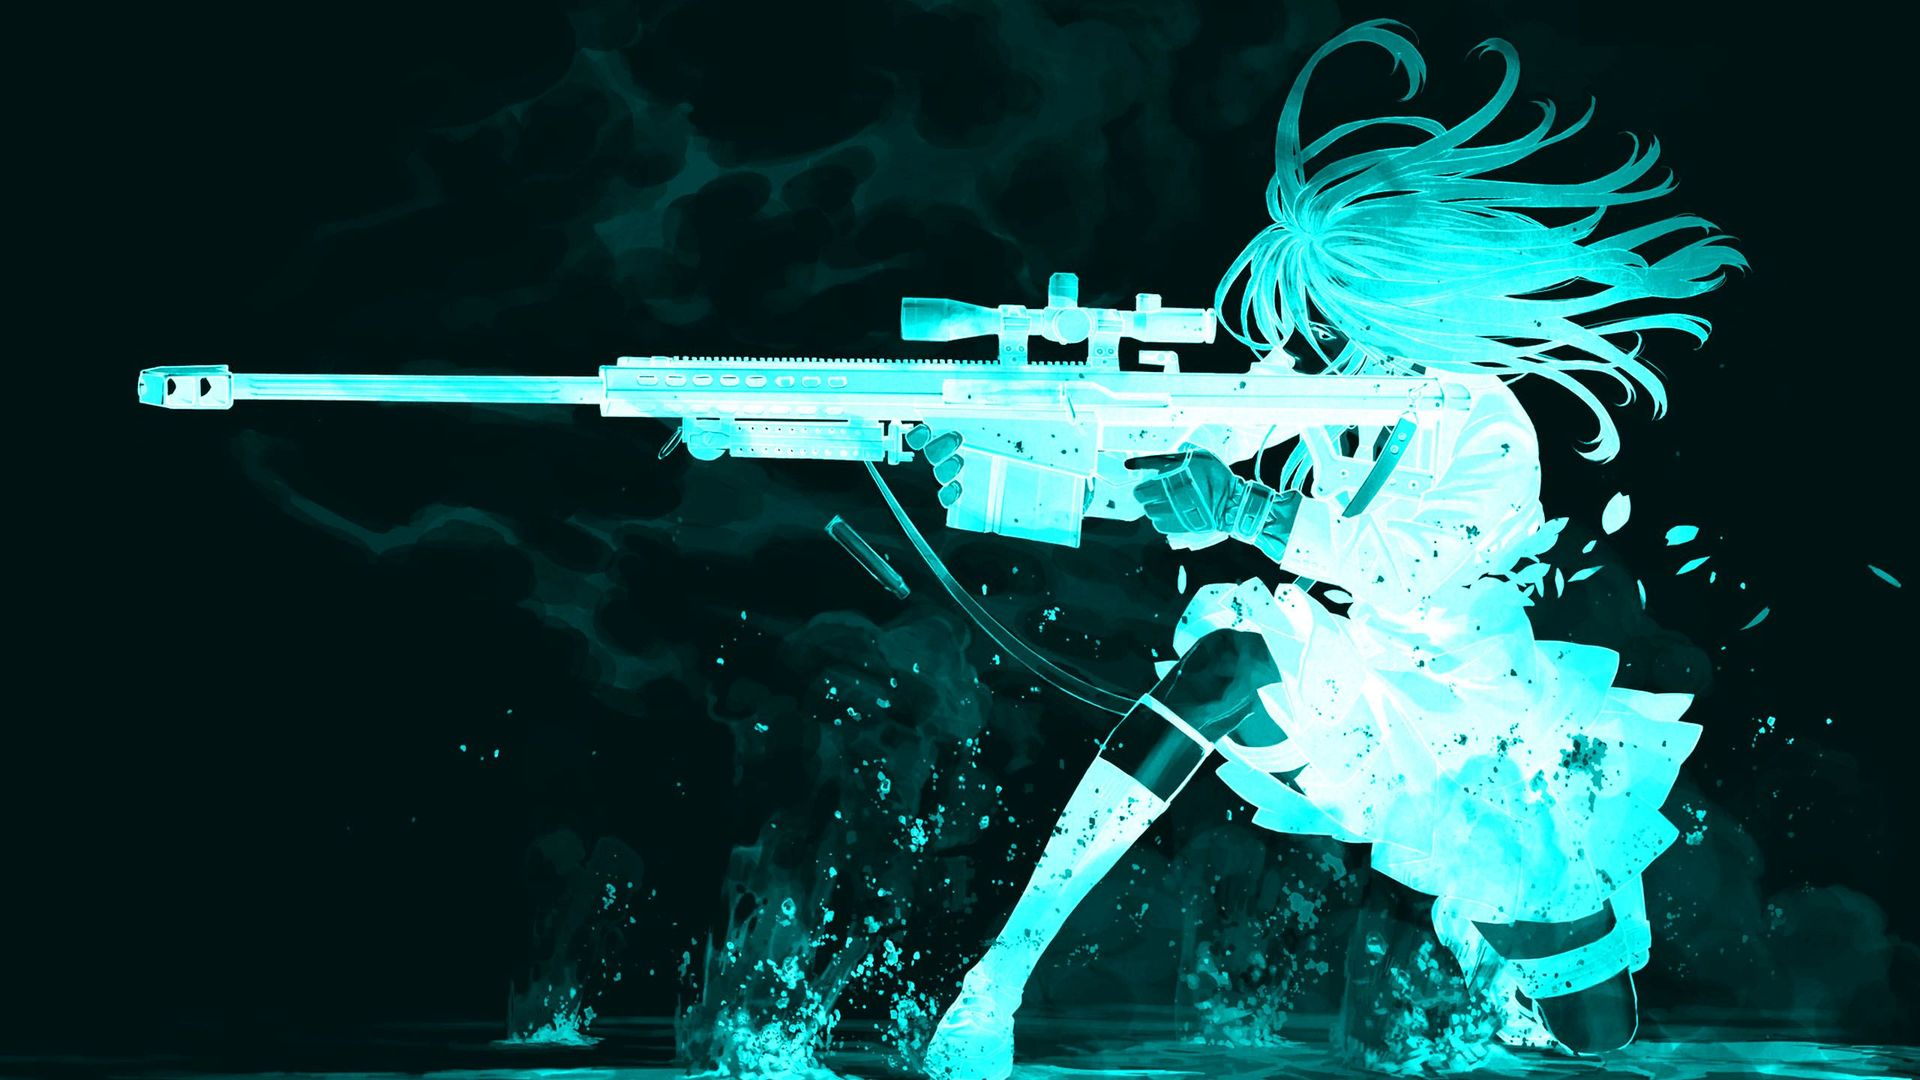 4k Anime Girl Ps4 Gun Wallpapers - Wallpaper Cave